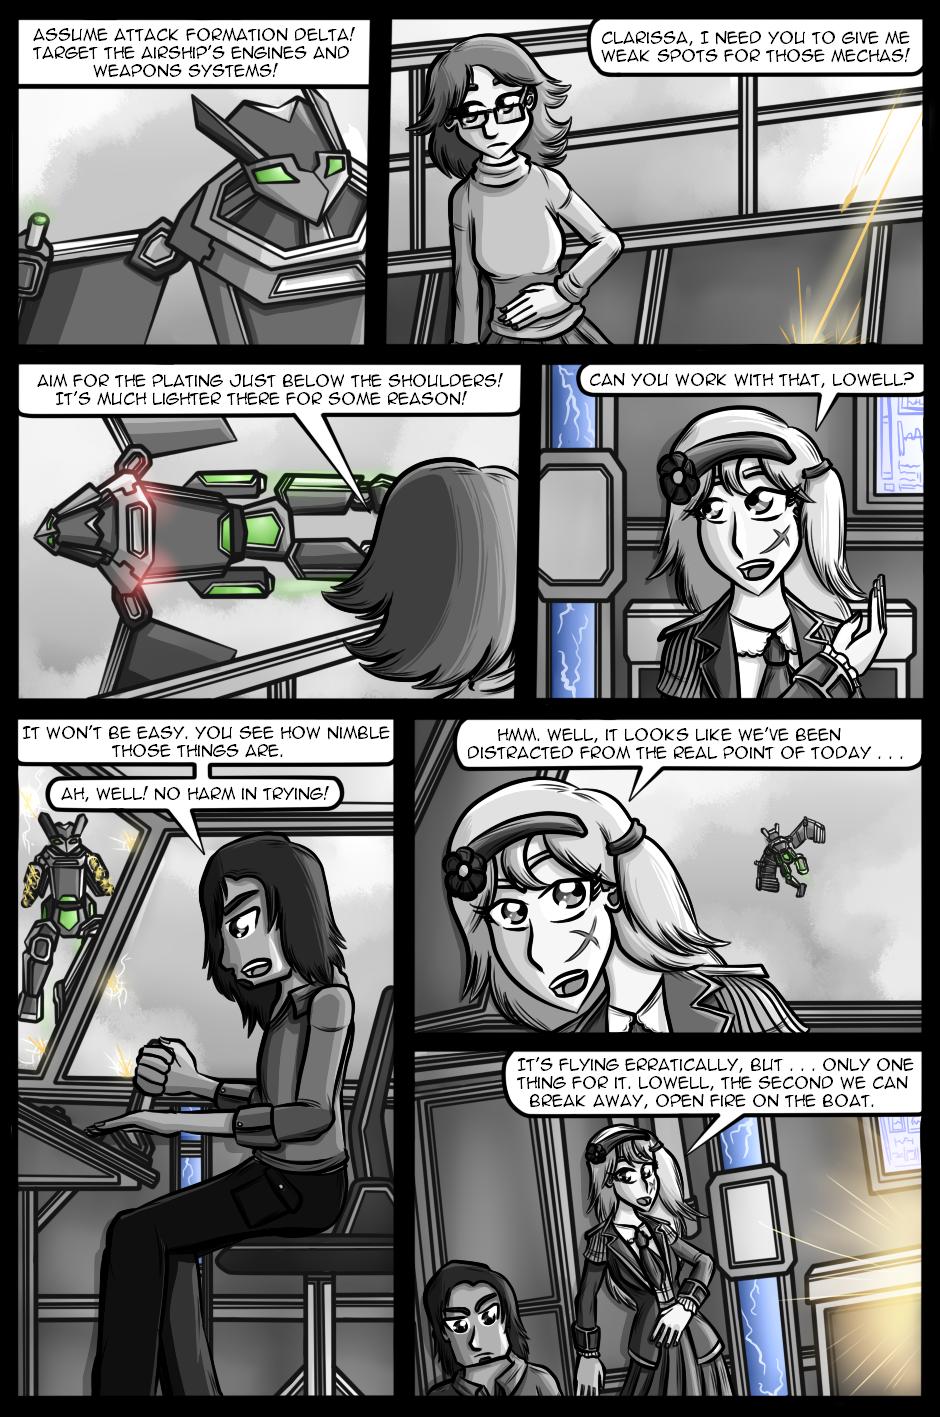 Fire Suppression, Part 29